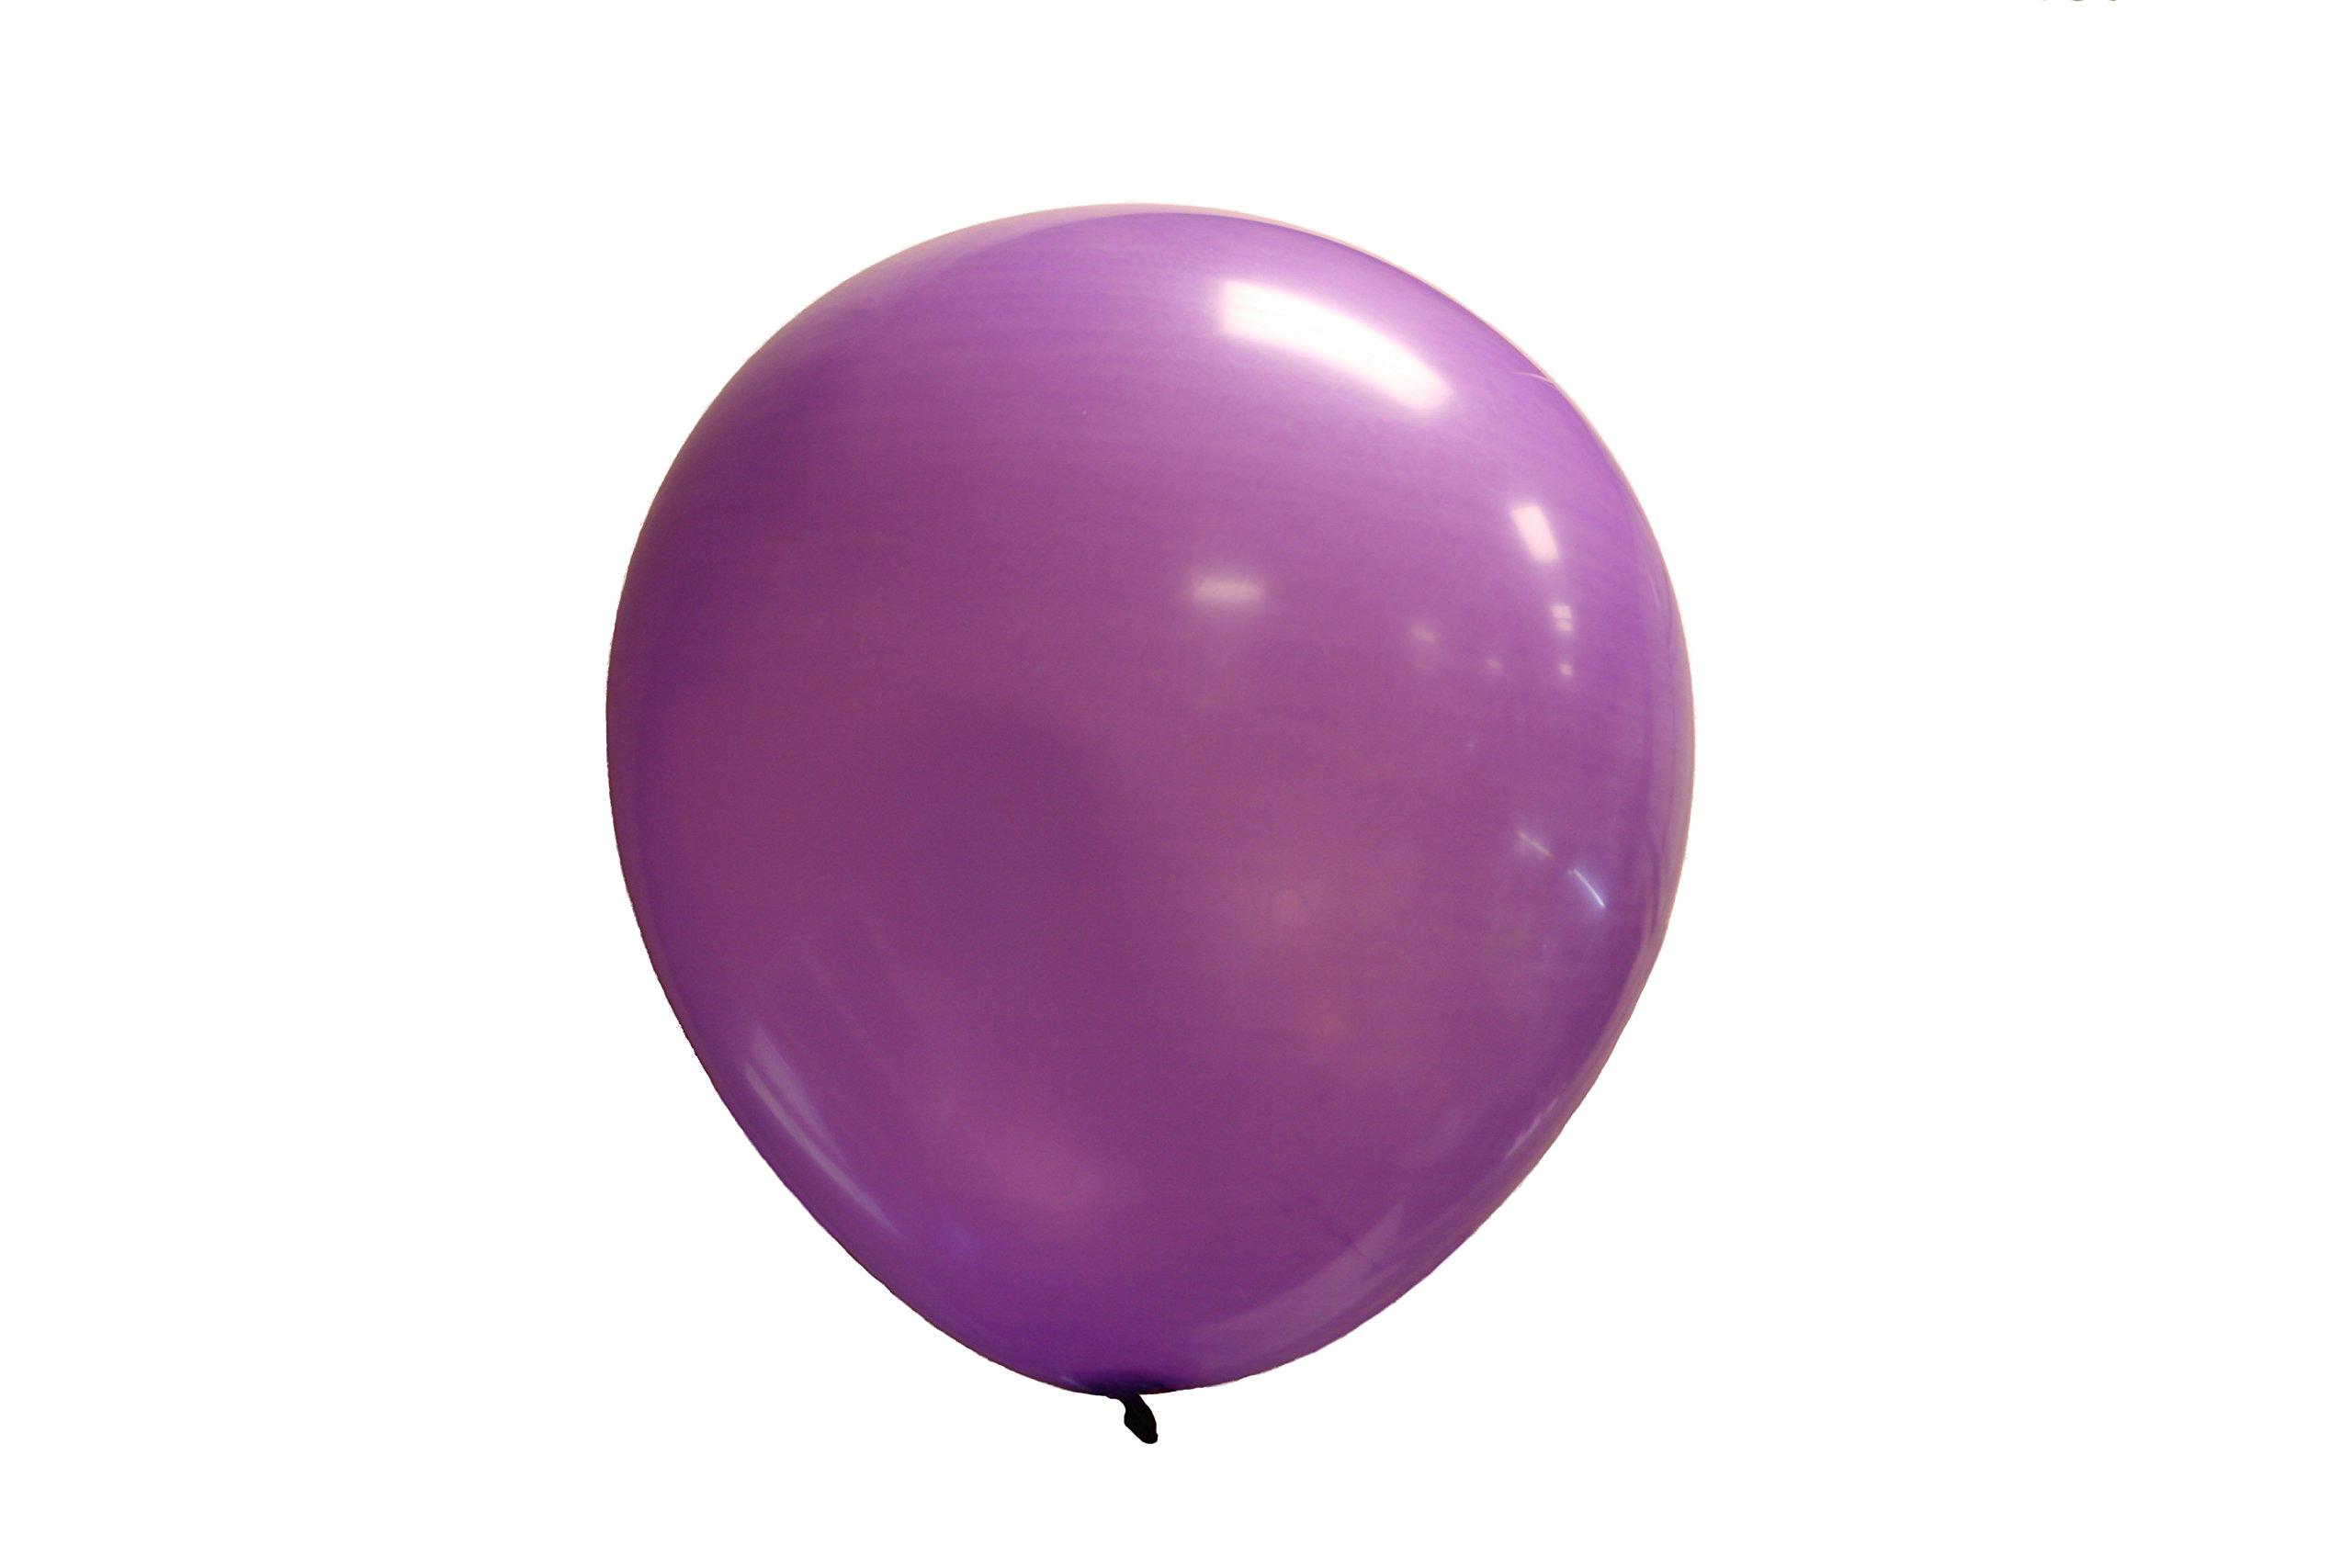 Buy Giant Water Balloon Now!